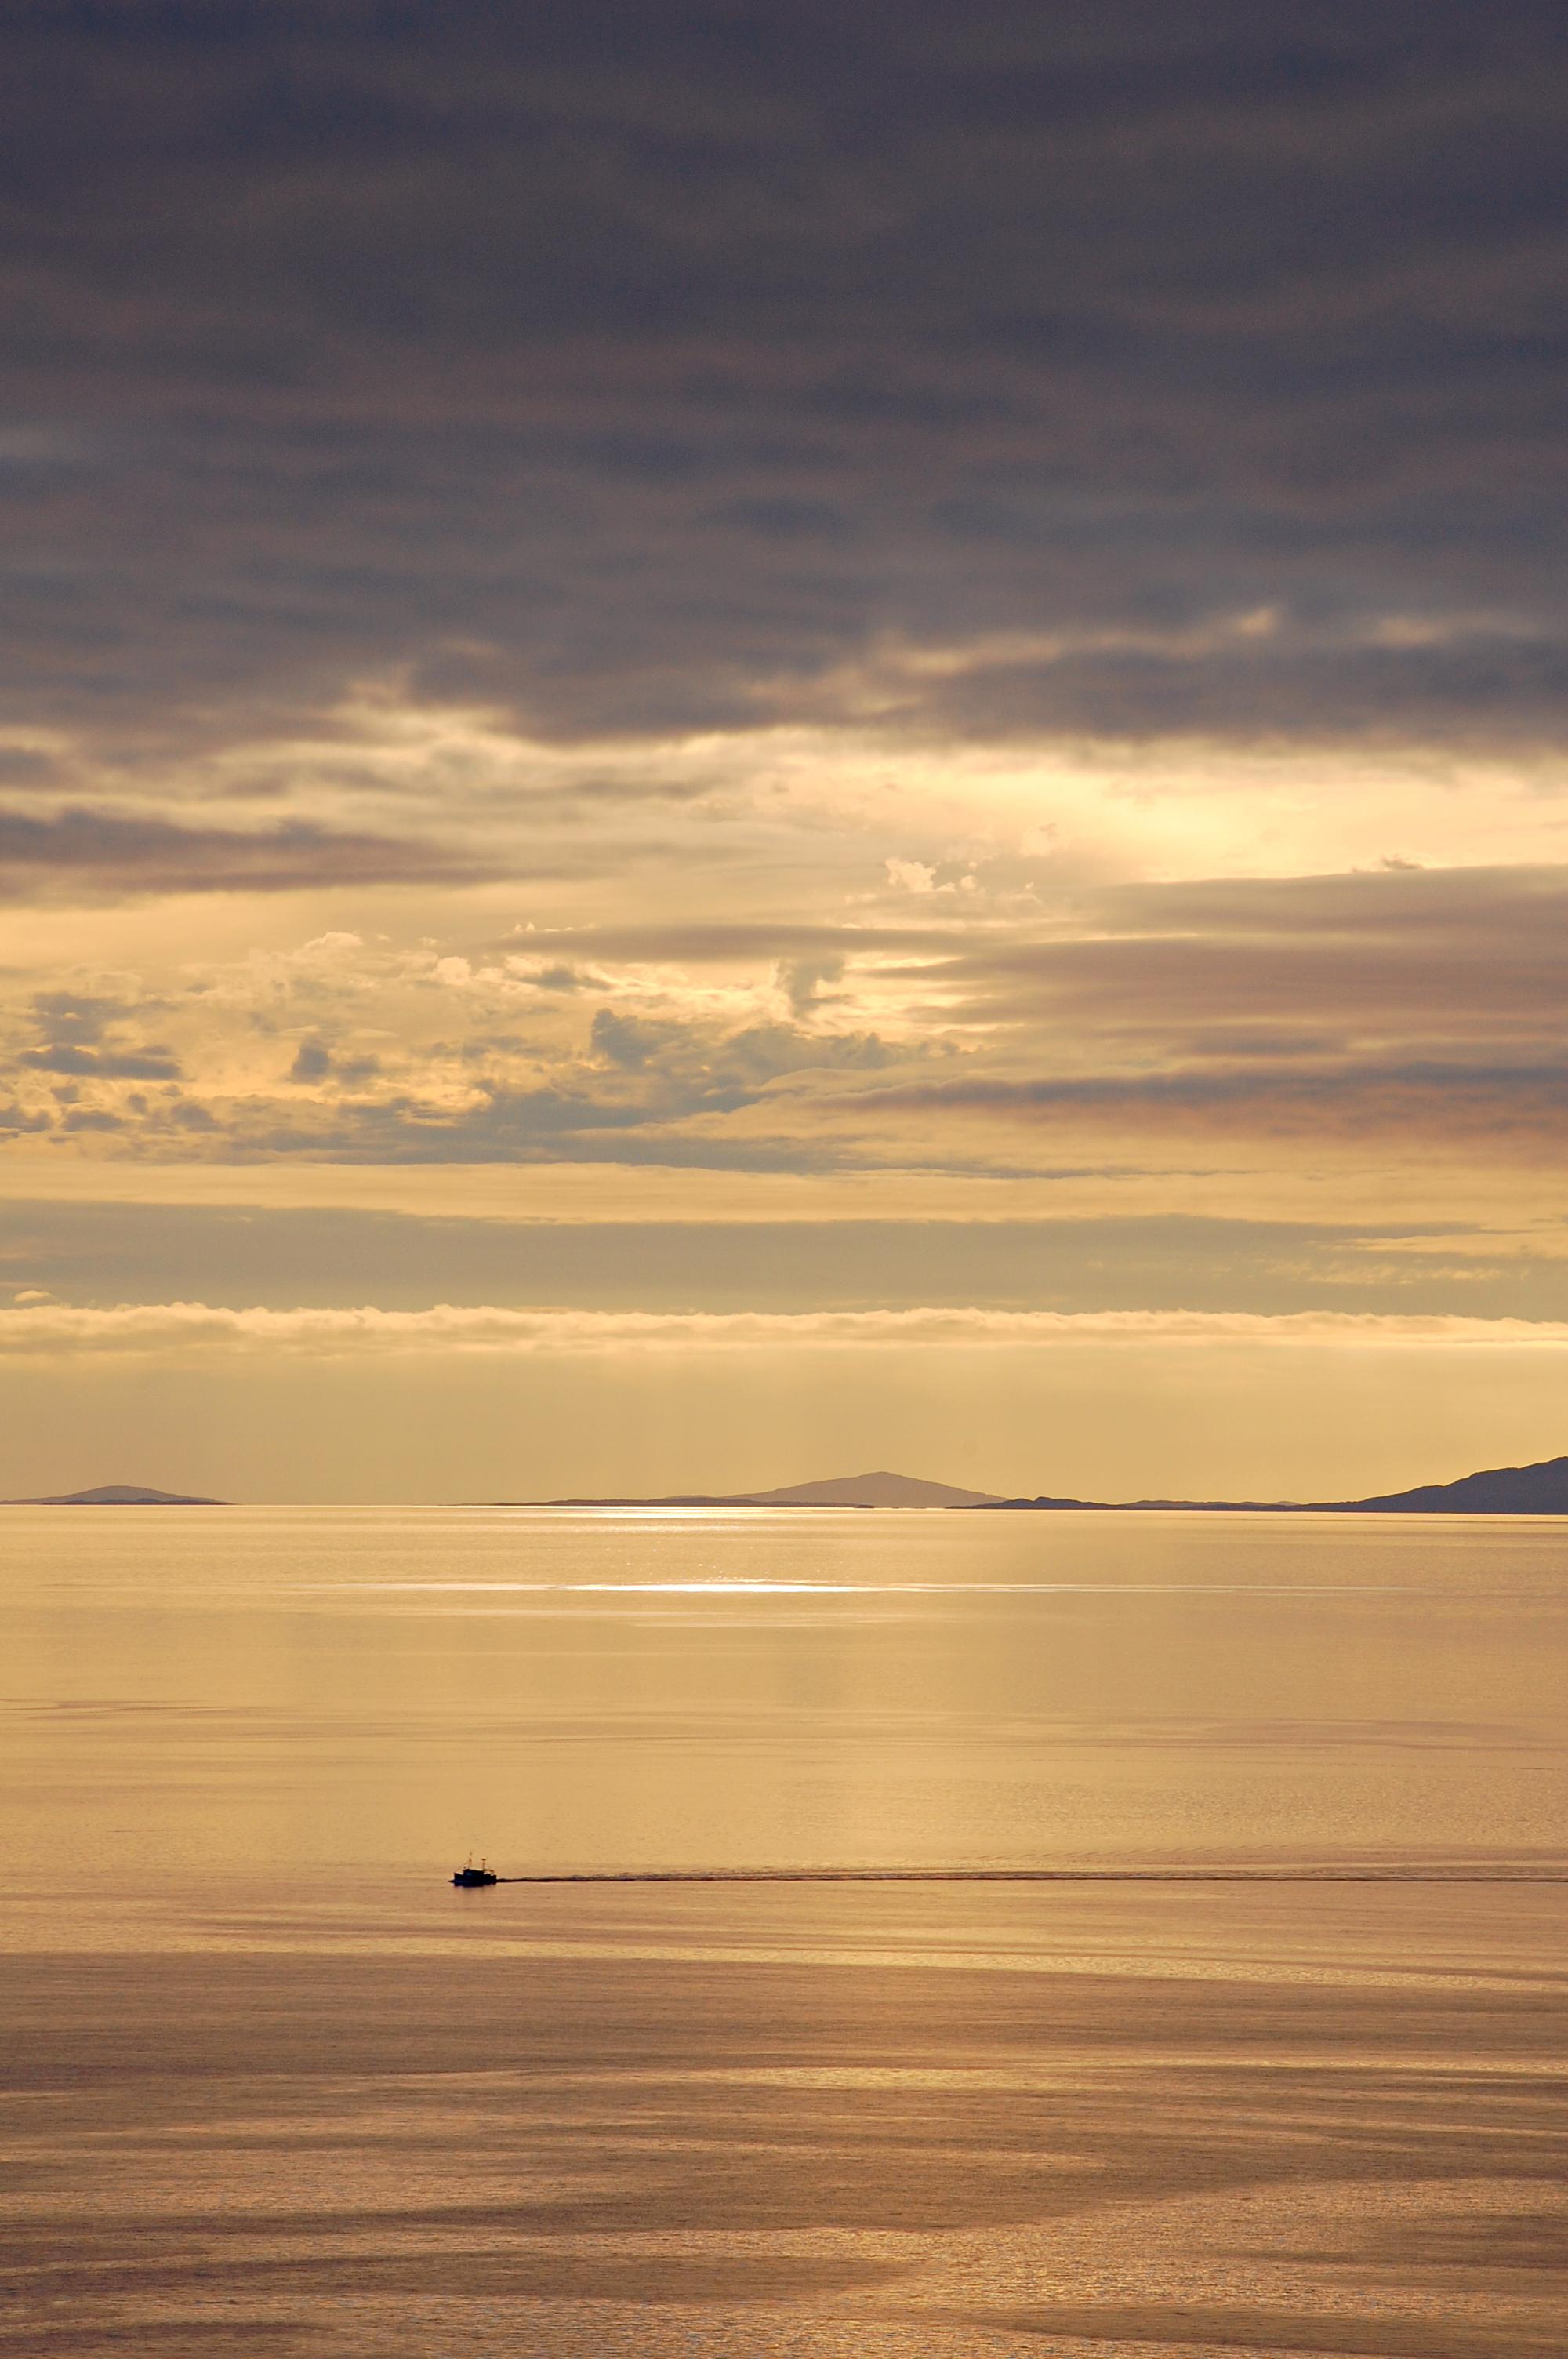 Fishing ship at sundown. (Uig, Isle of Skye, Scotland; Aug 2010)